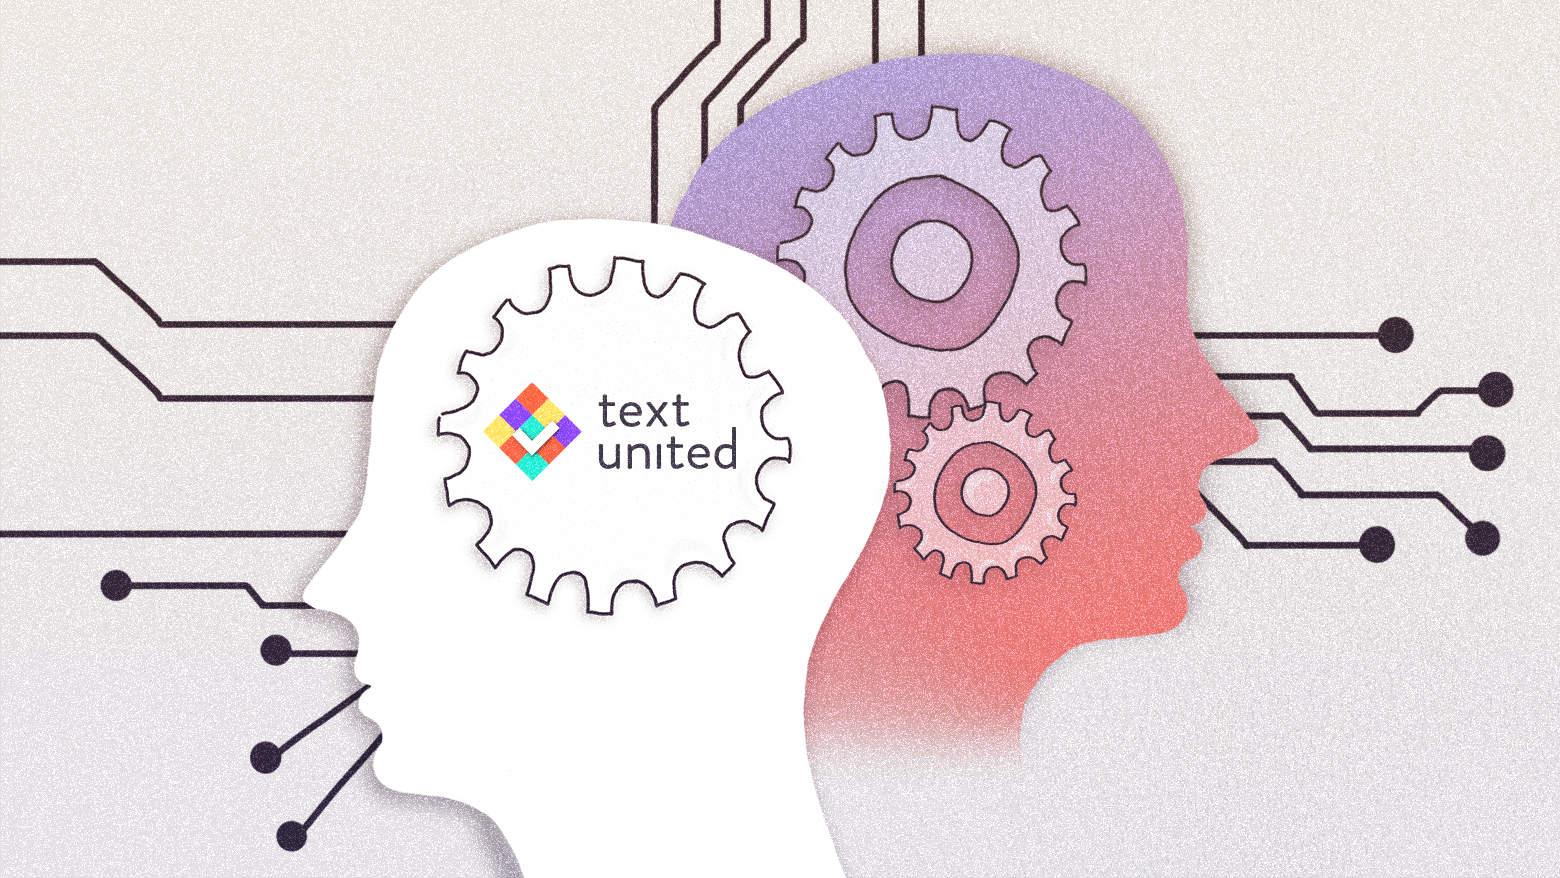 Free Machine Translation Engines, the best so far